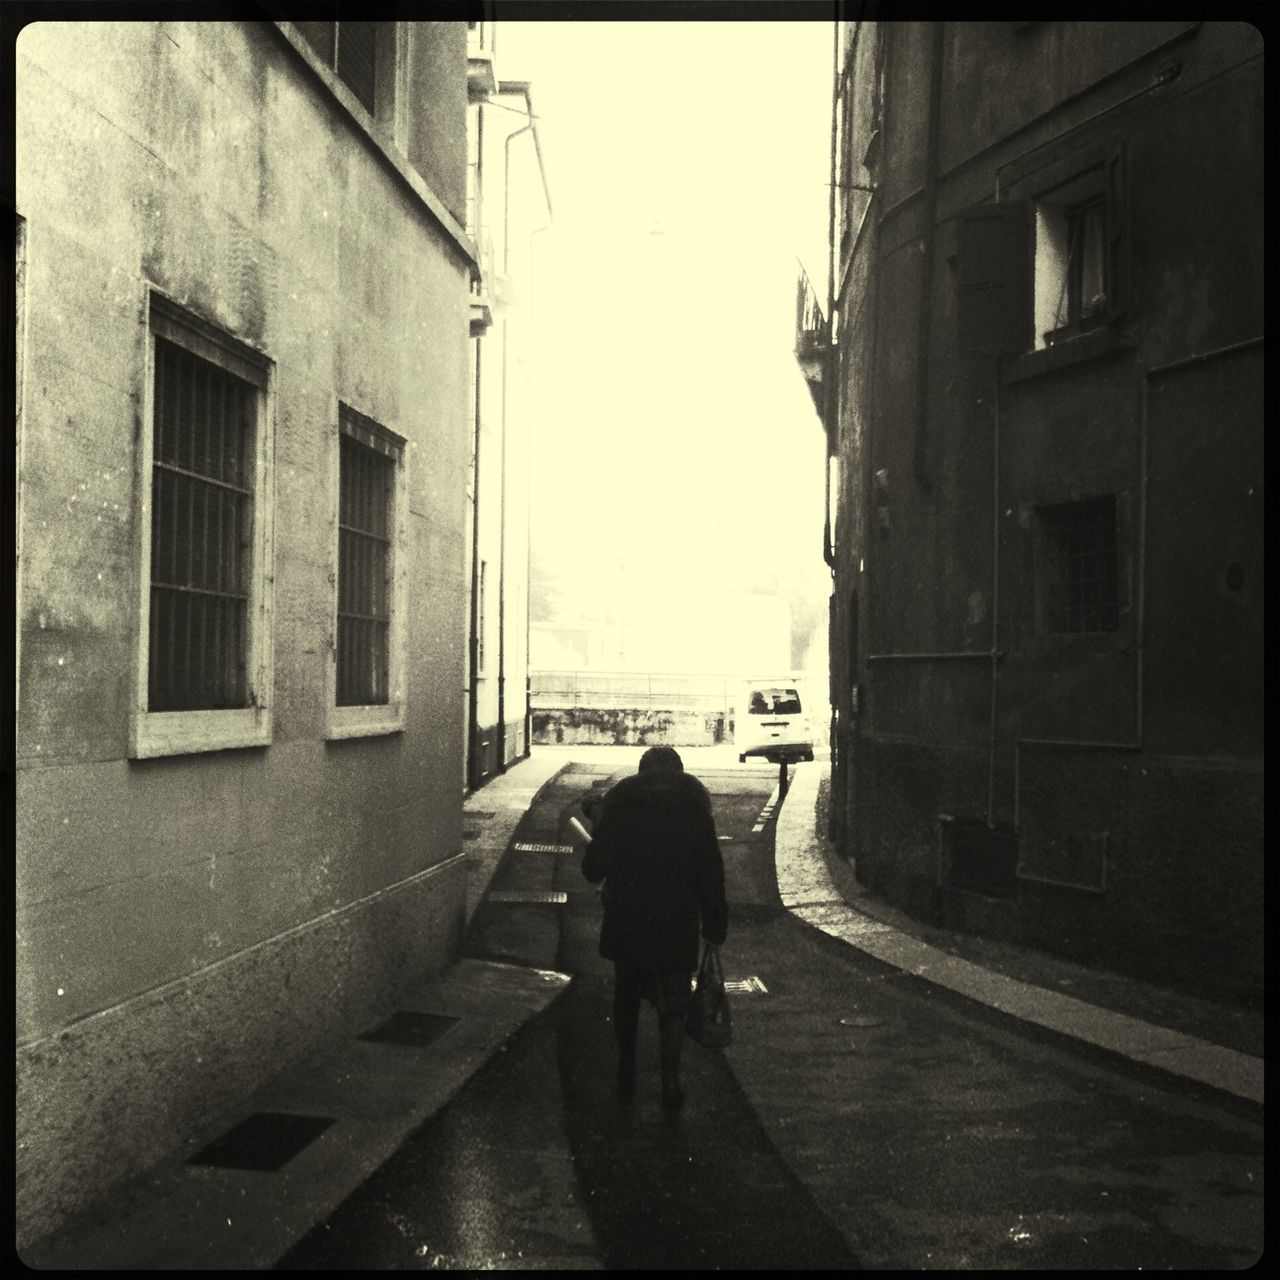 Silhouette Man Walking On Pathway Along Buildings